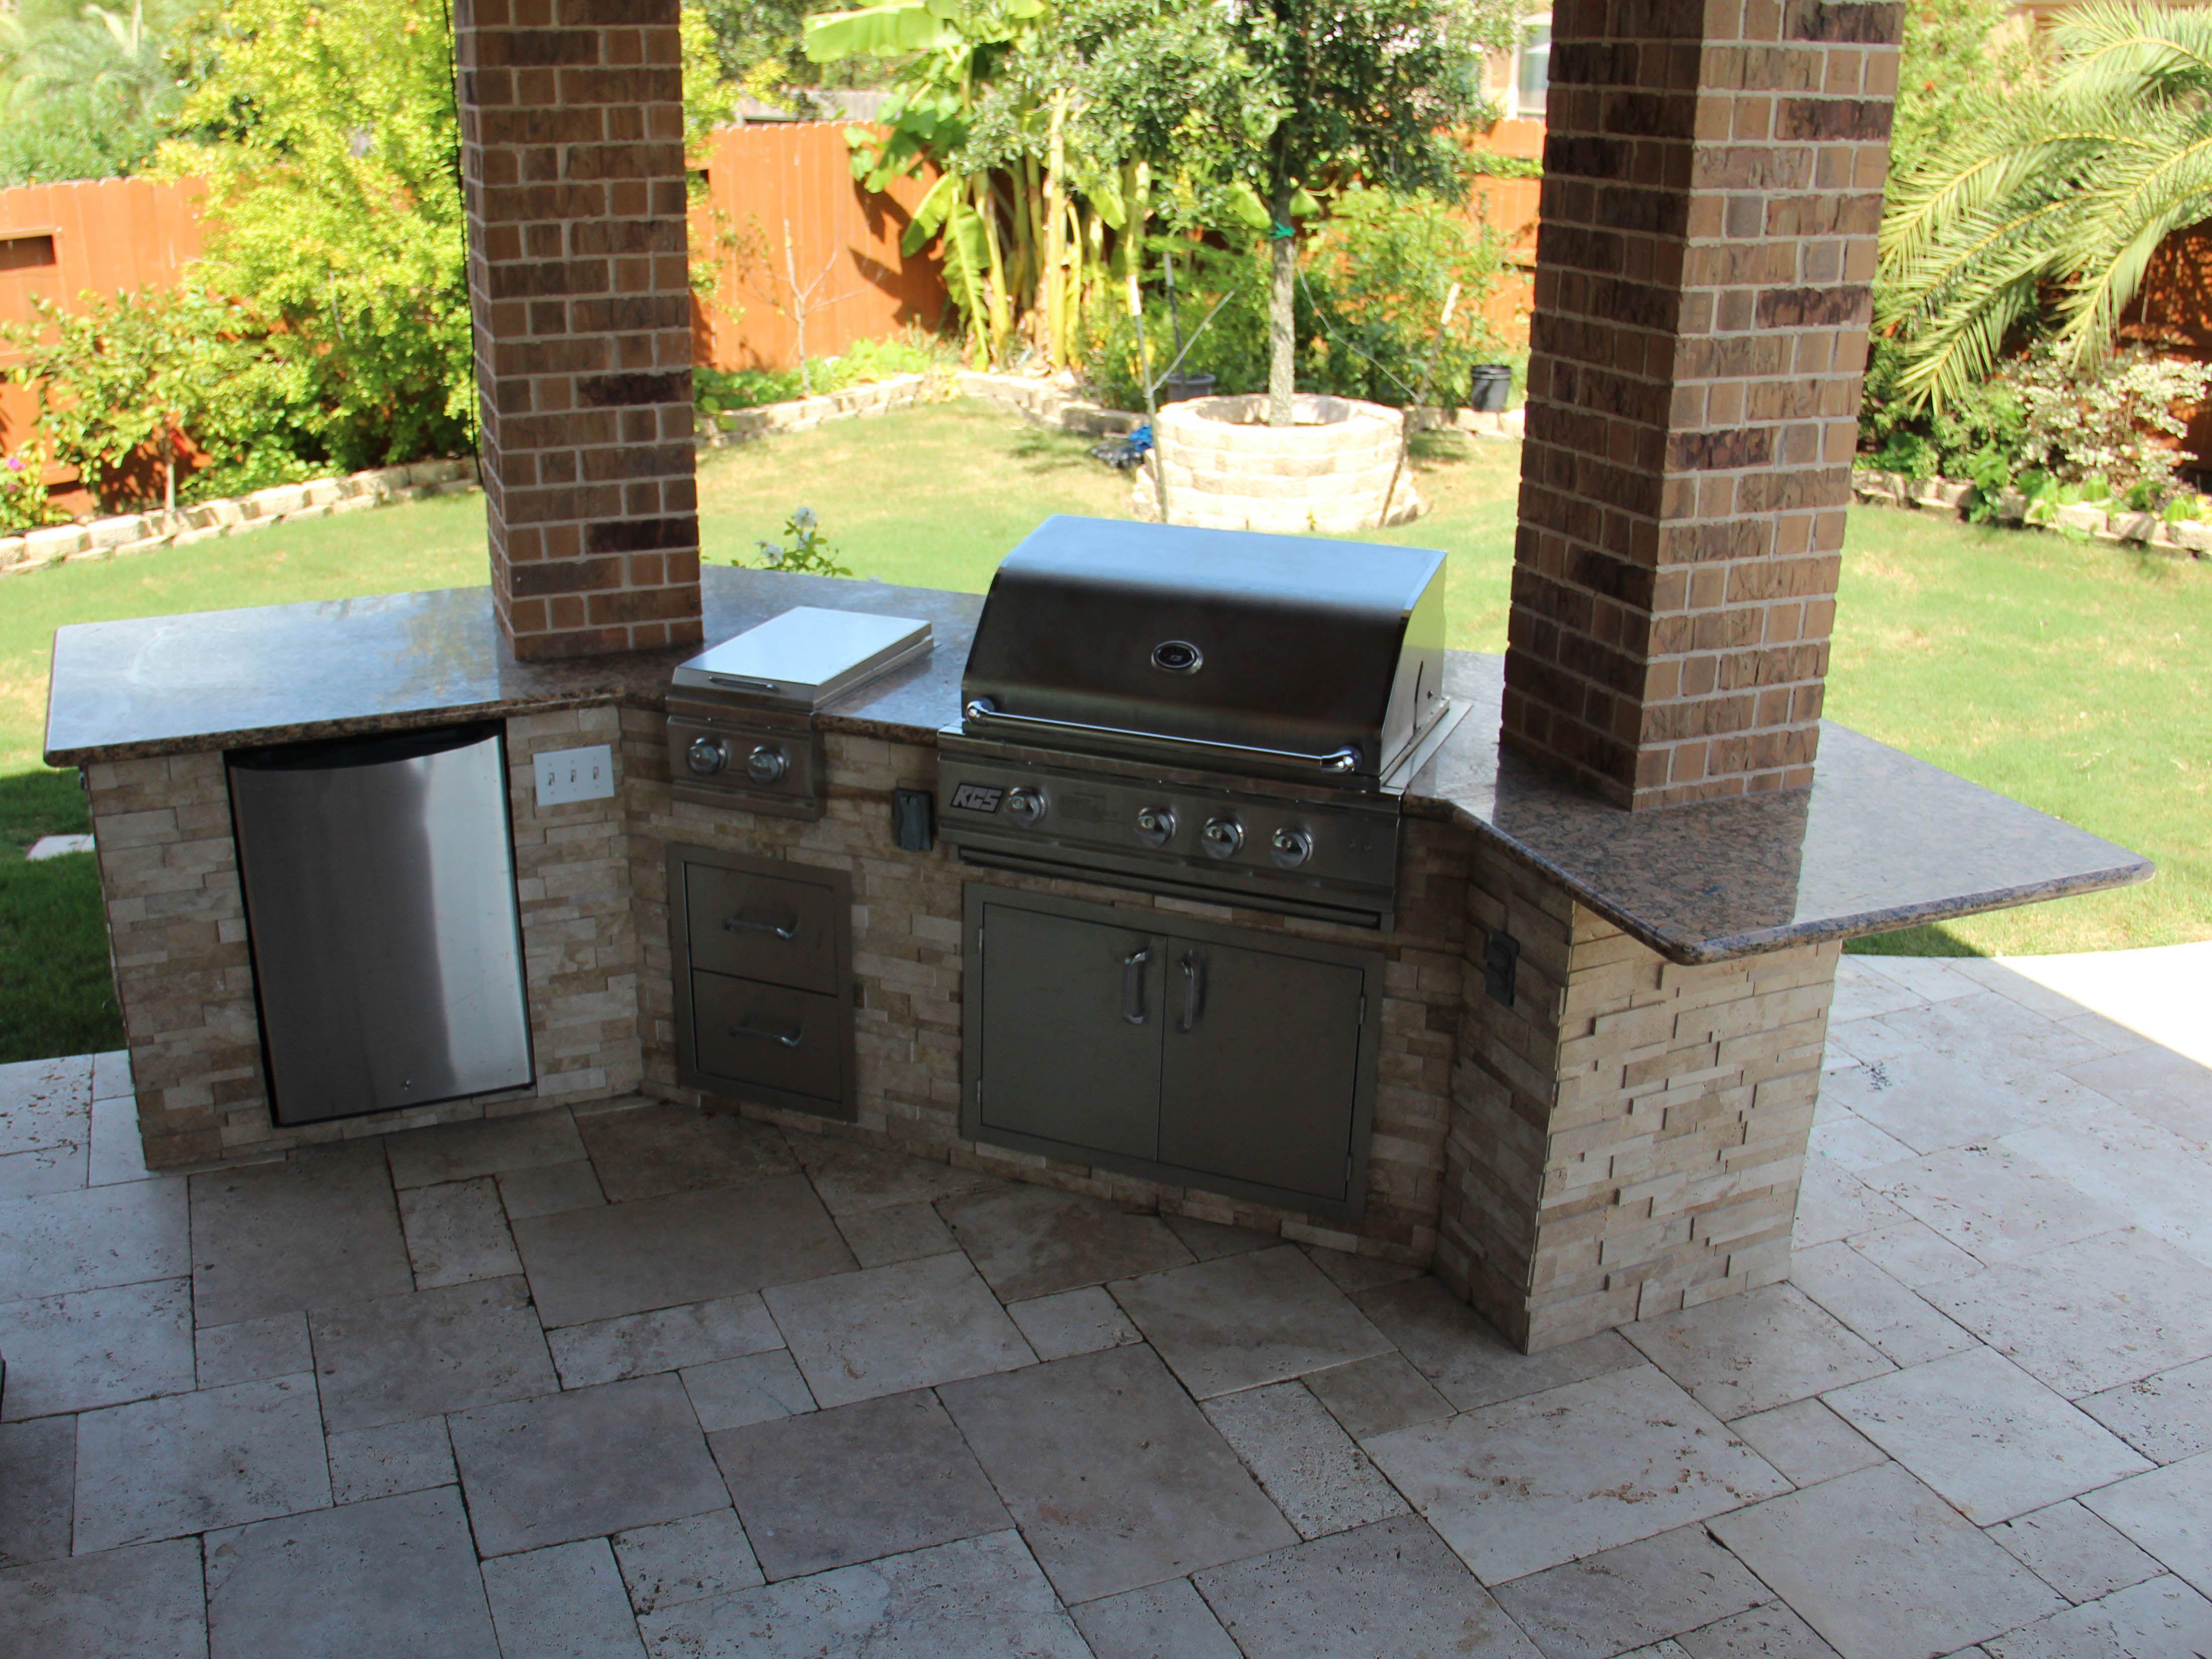 Www Customoutdoors Com Outdoor Kitchen With Refrigerator Side Burner Grill Outdoor Kitchen Outdoor Decor Outdoor